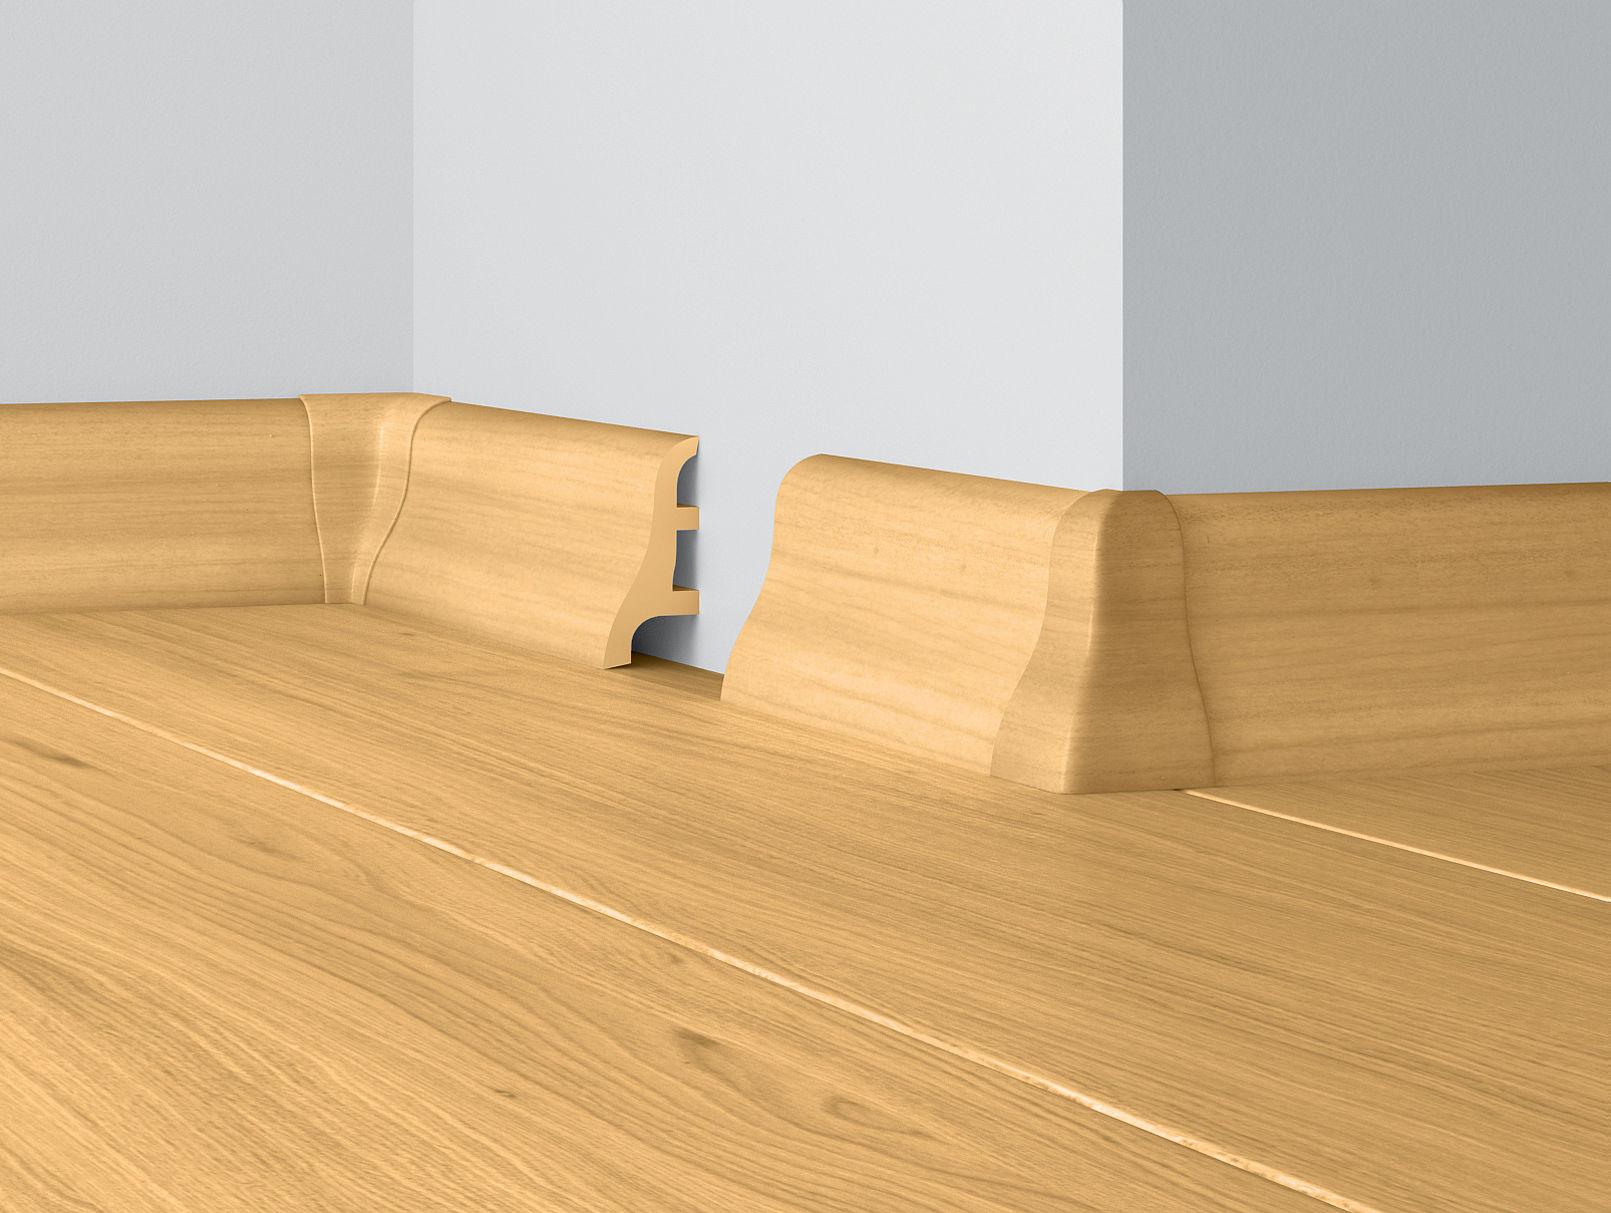 Podlahová lišta DÖLLKEN USL 50 délka 2,50m, Barevnice DÖLLKEN USL 50 0110 (W225)